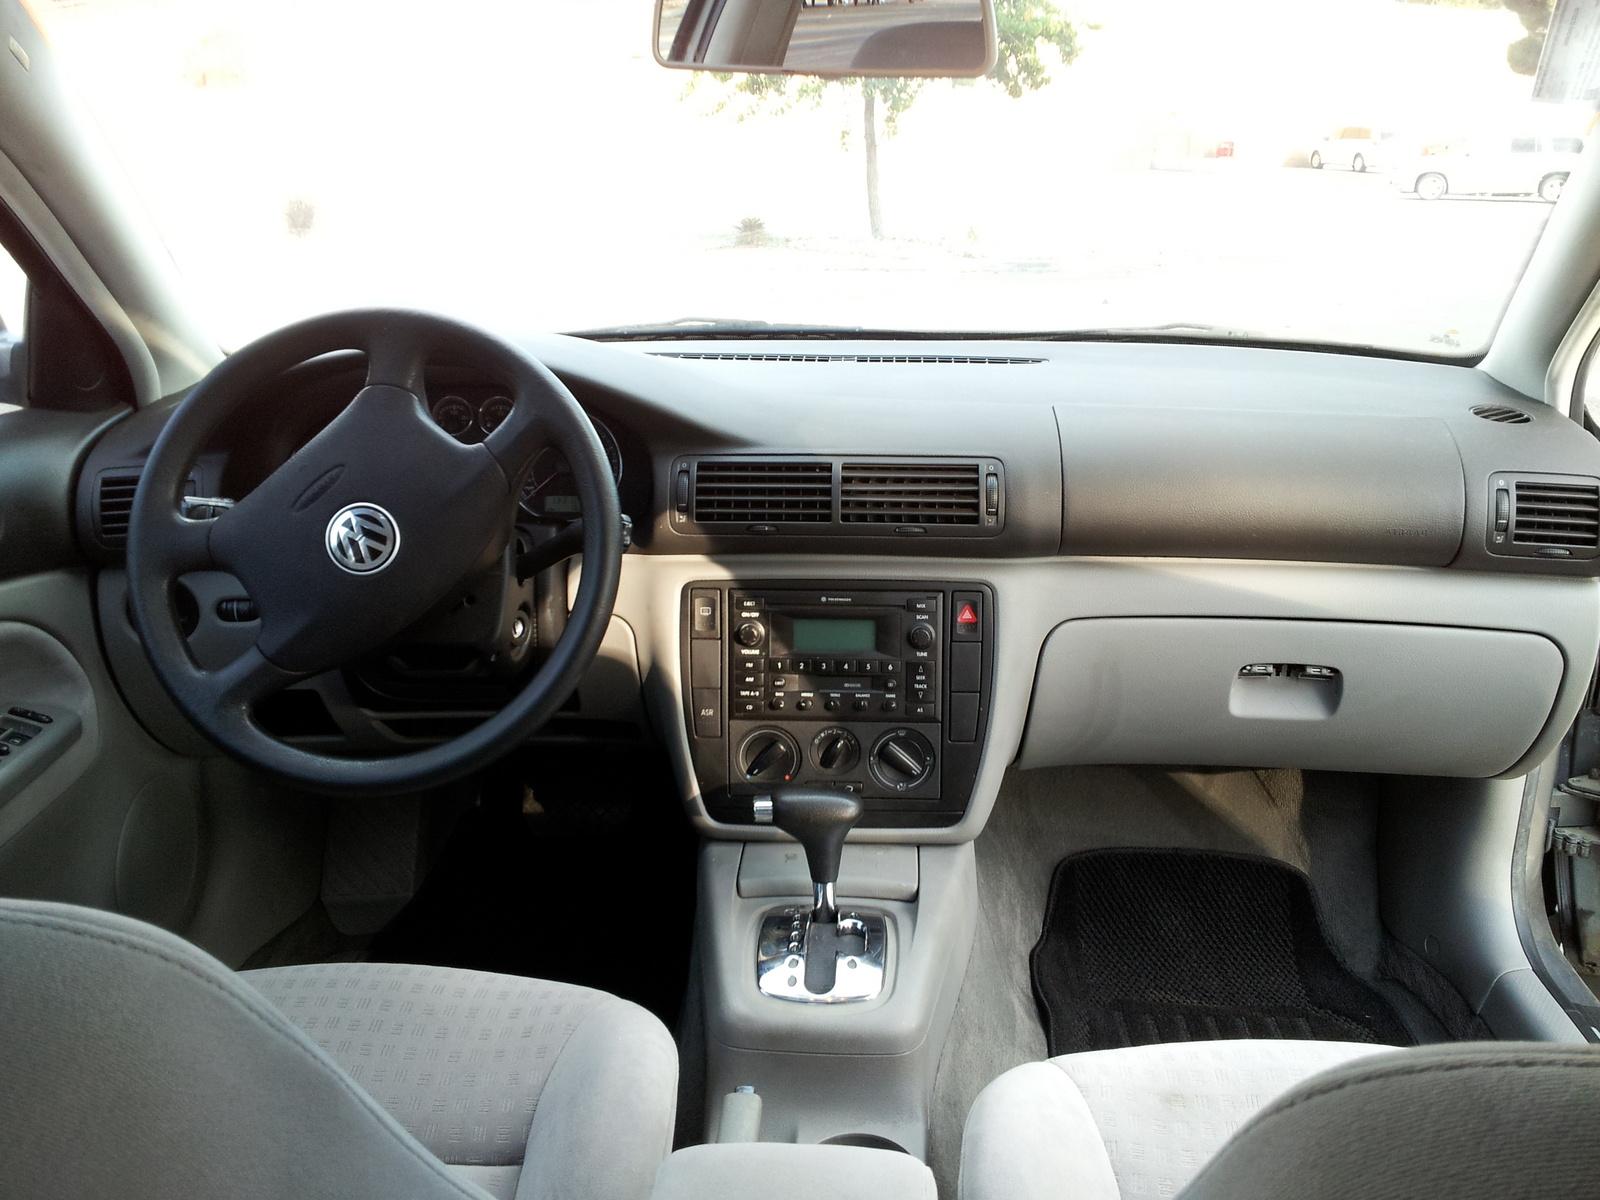 2002 Volkswagen Passat Interior Pictures Cargurus